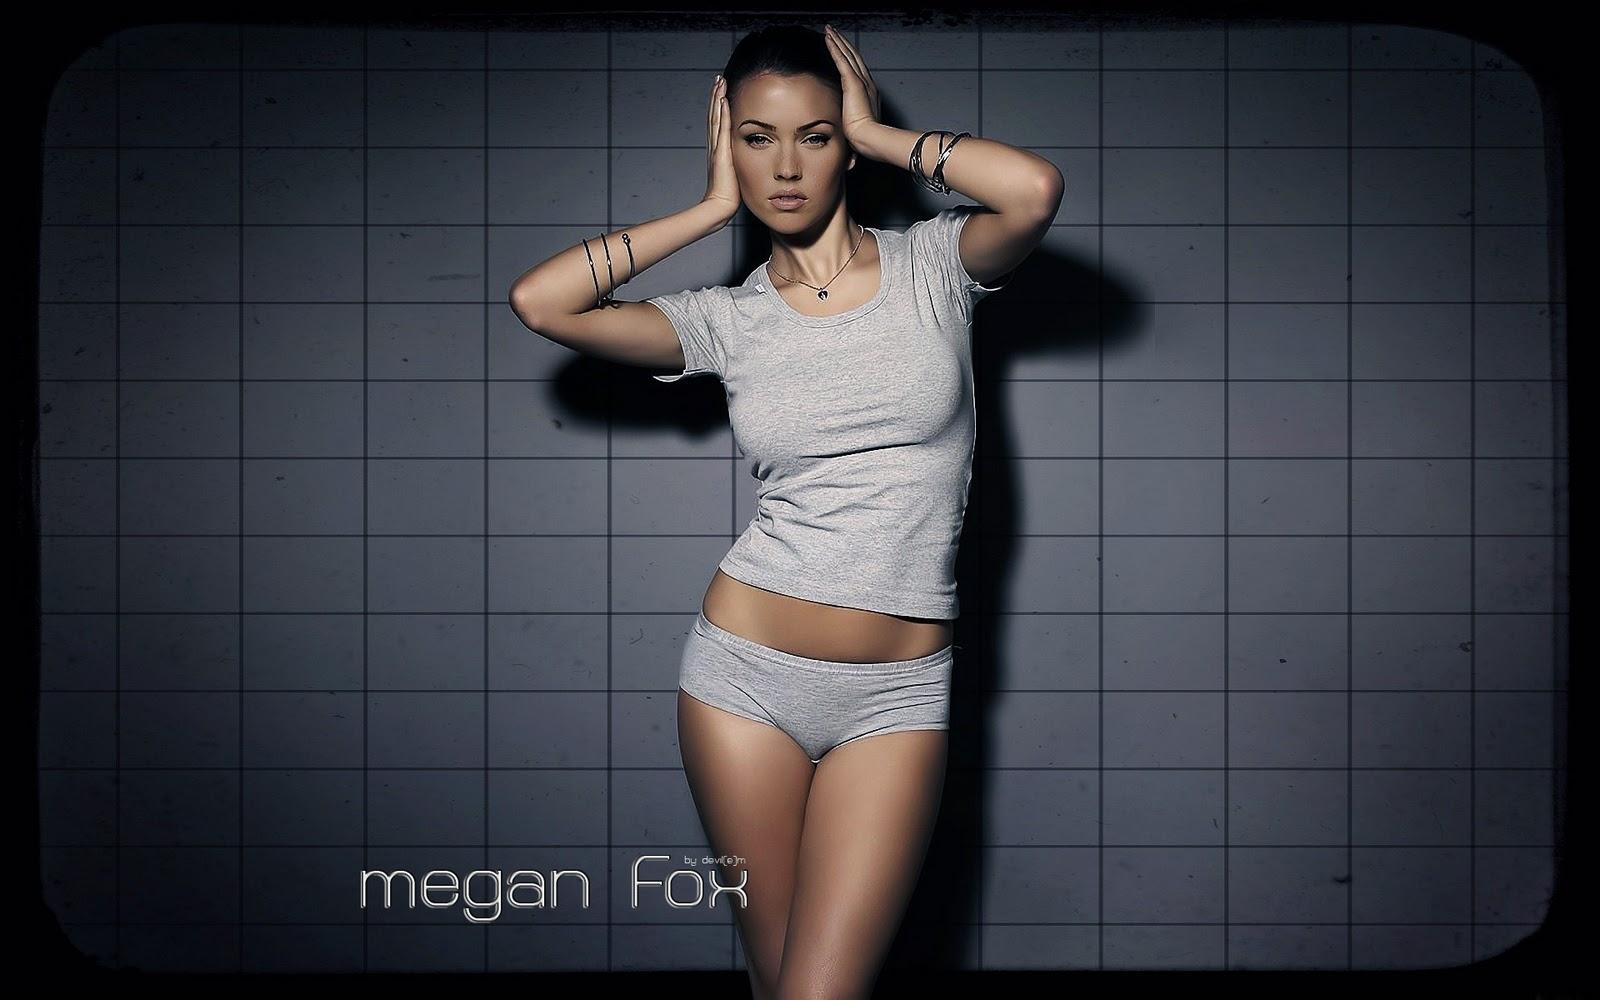 hollywood wallpedia: megan fox wallpaper widescreen hd